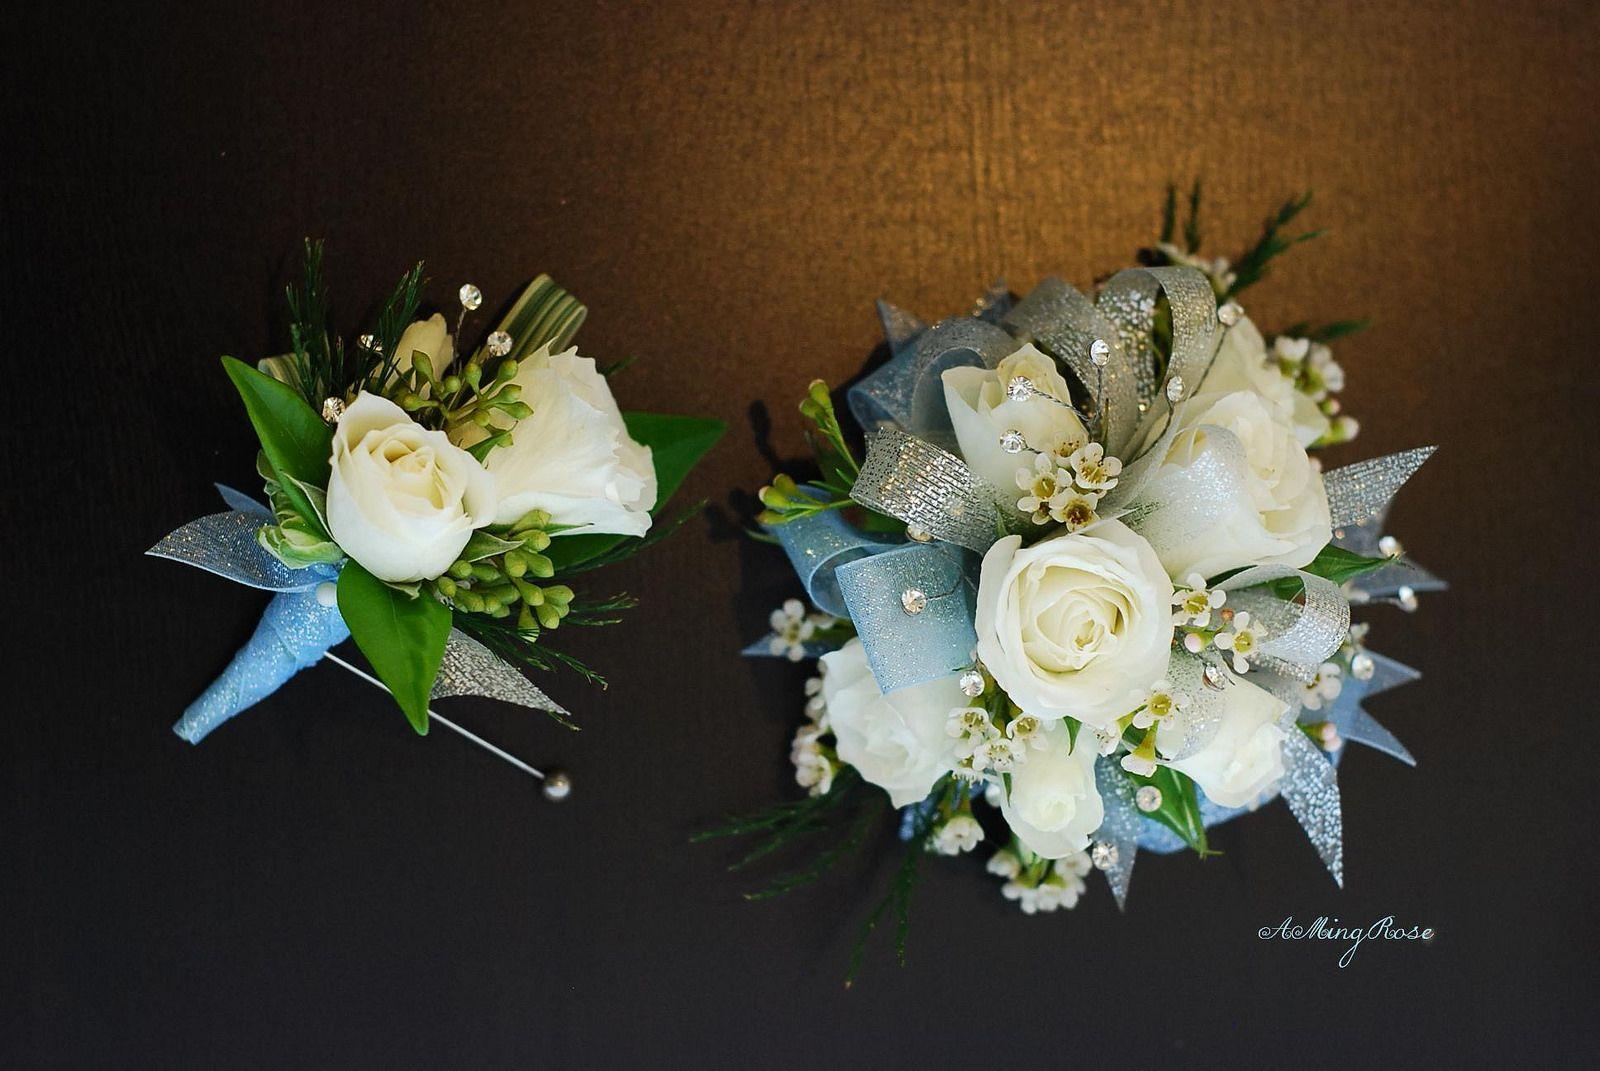 Beautiful Silver And Light Blue Wrist Corsage U0026 Boutonniere | Amrose Flowers | Flickr